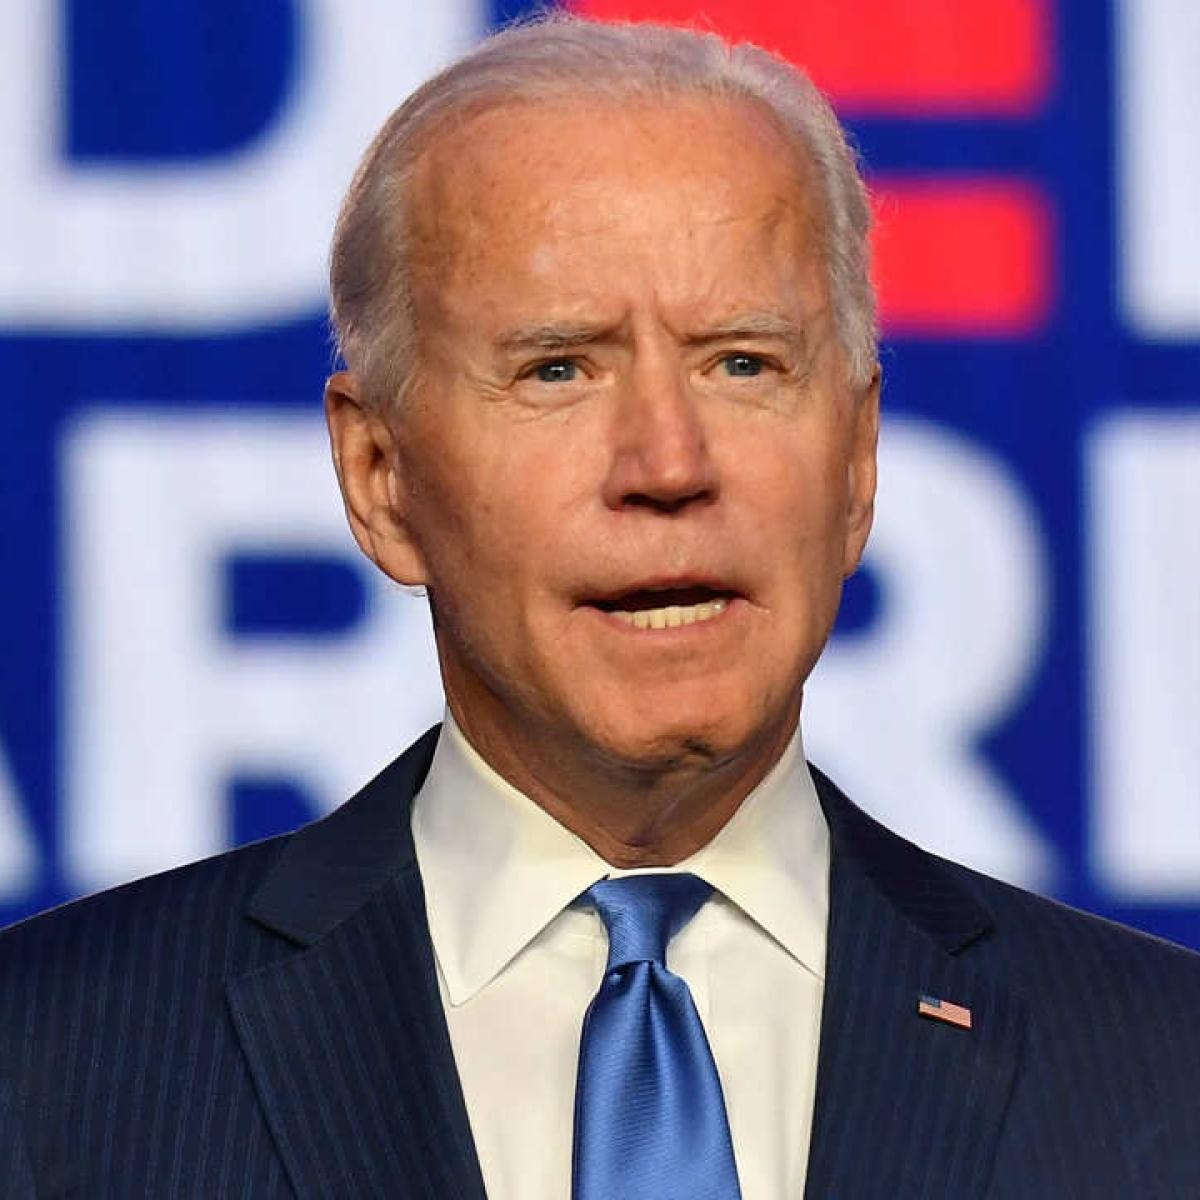 US President-elect Joe Biden appoints Indian-American Bharat Ramamurti as member of National Economic Council